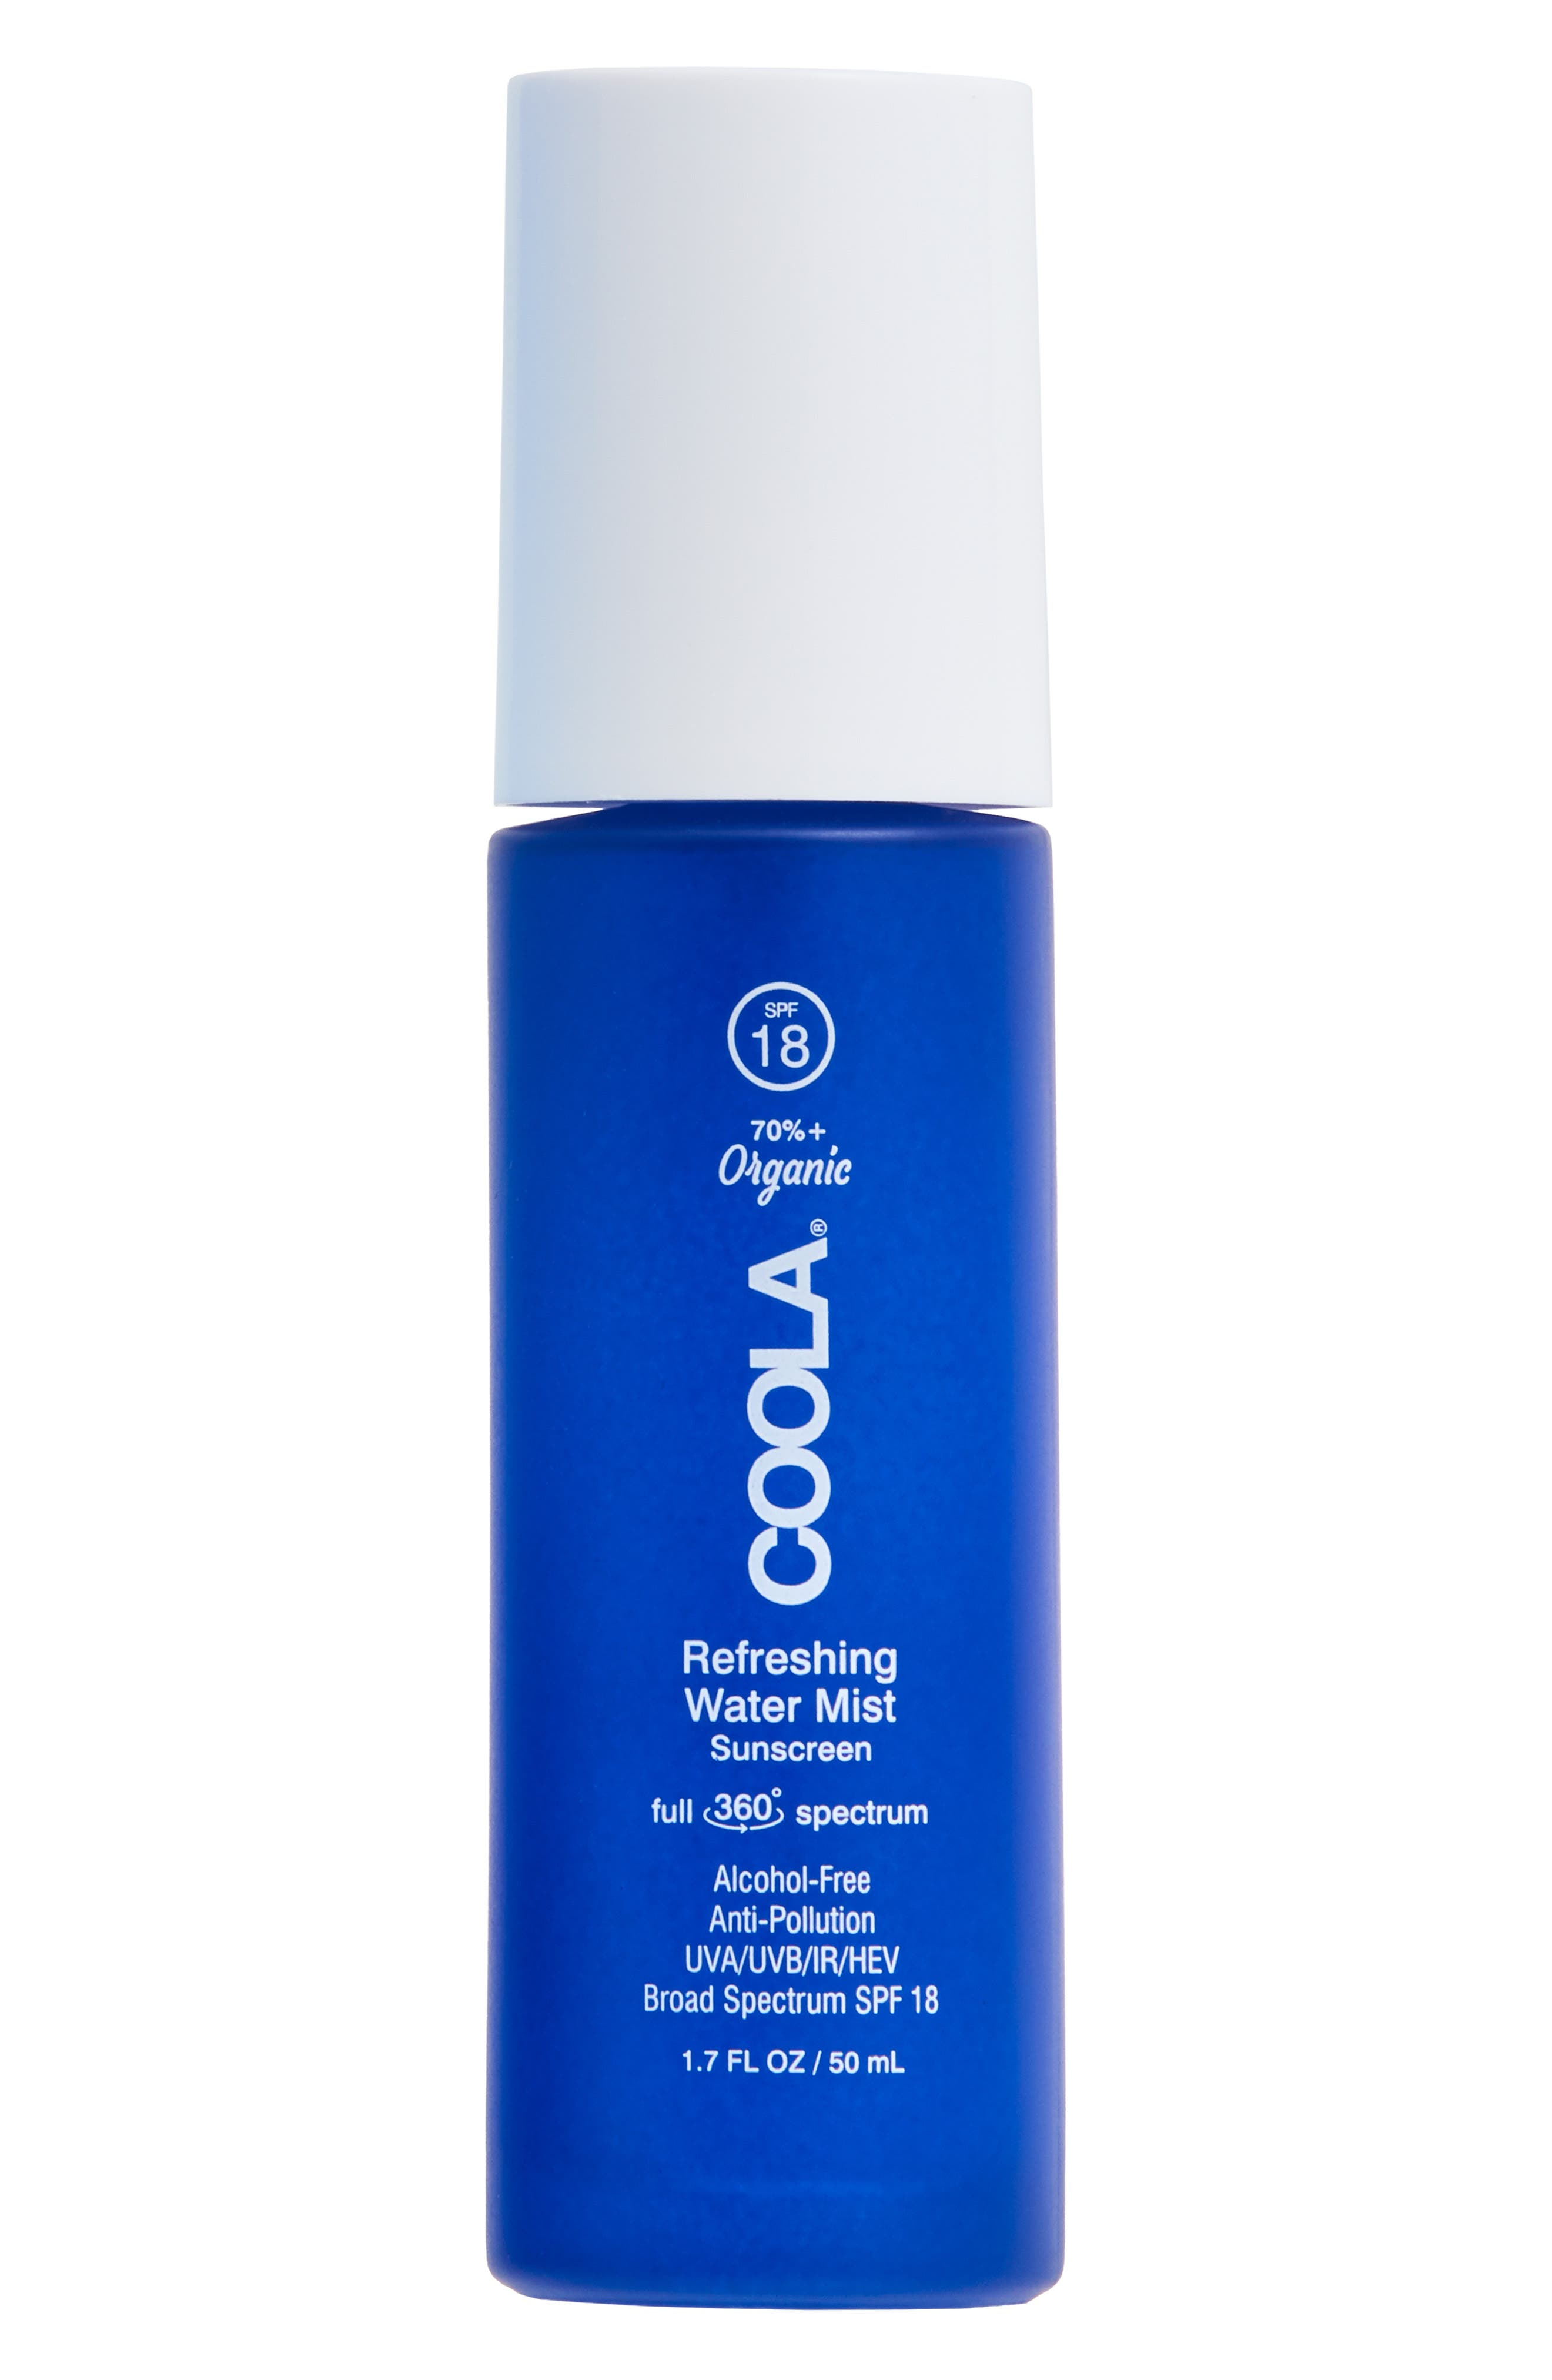 Coola Suncare Refreshing Water Mist Spf 18 Sunscreen